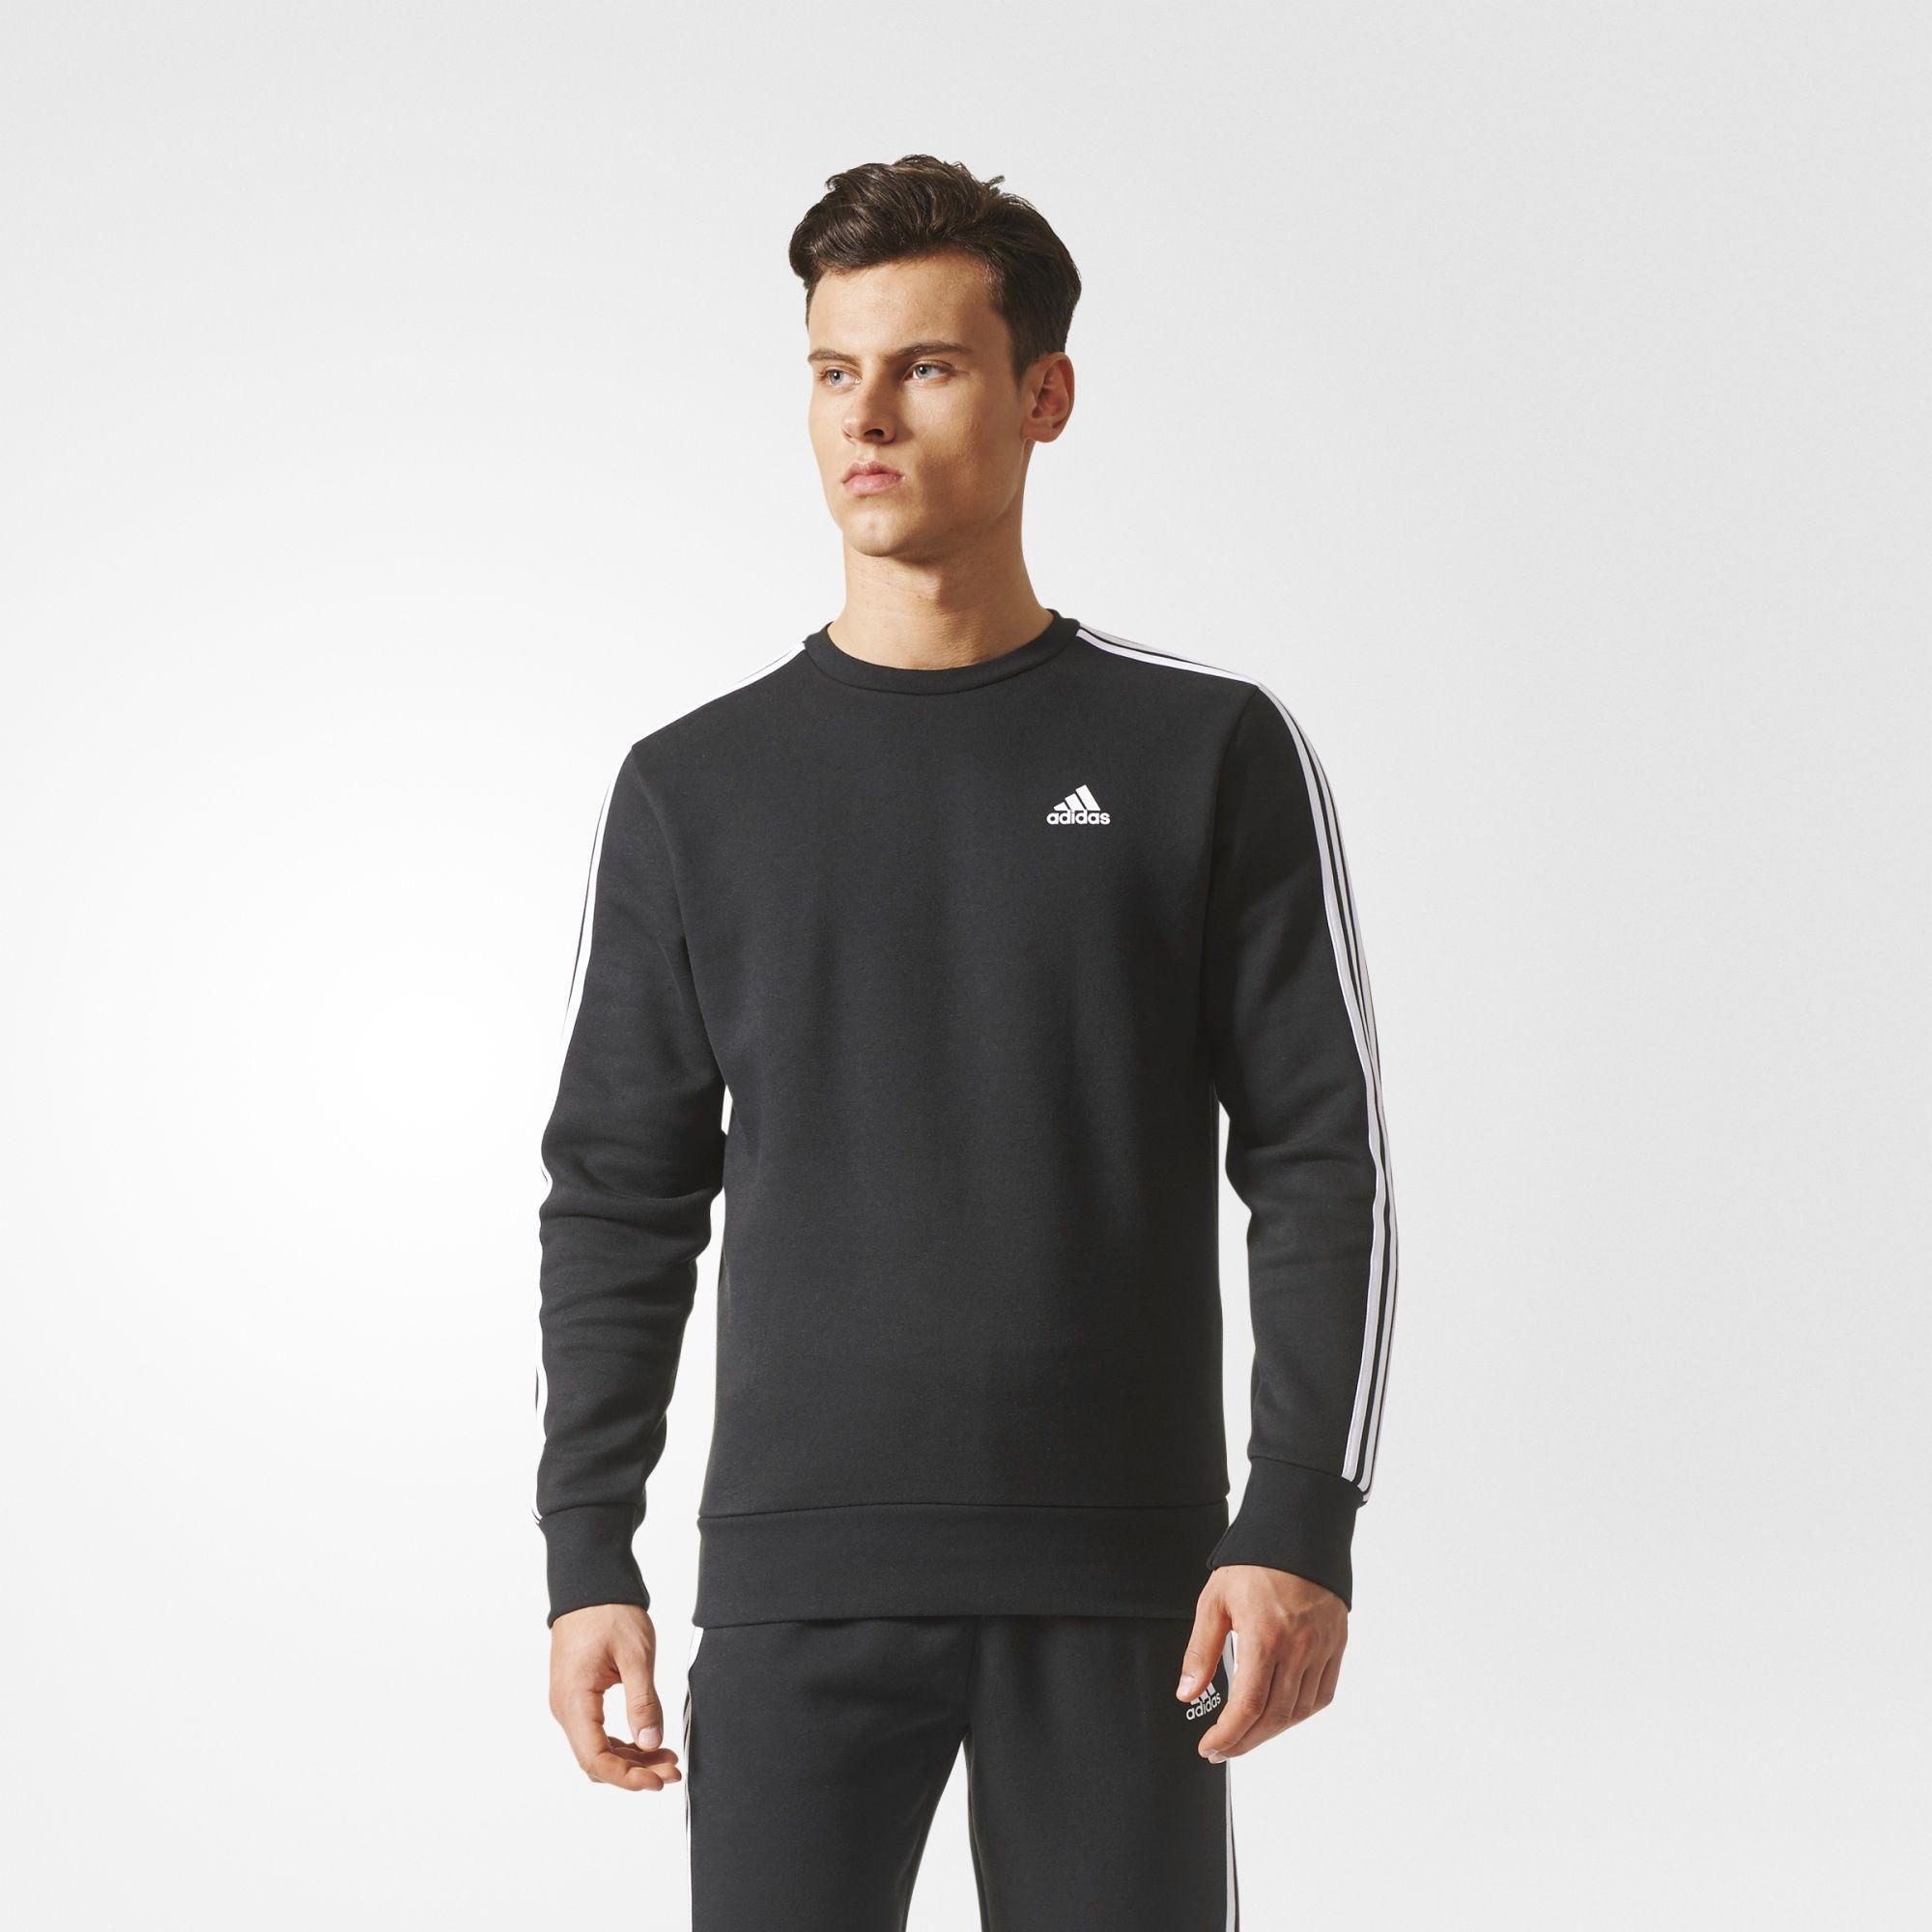 Herren Essentials 3-Streifen Sweatshirt